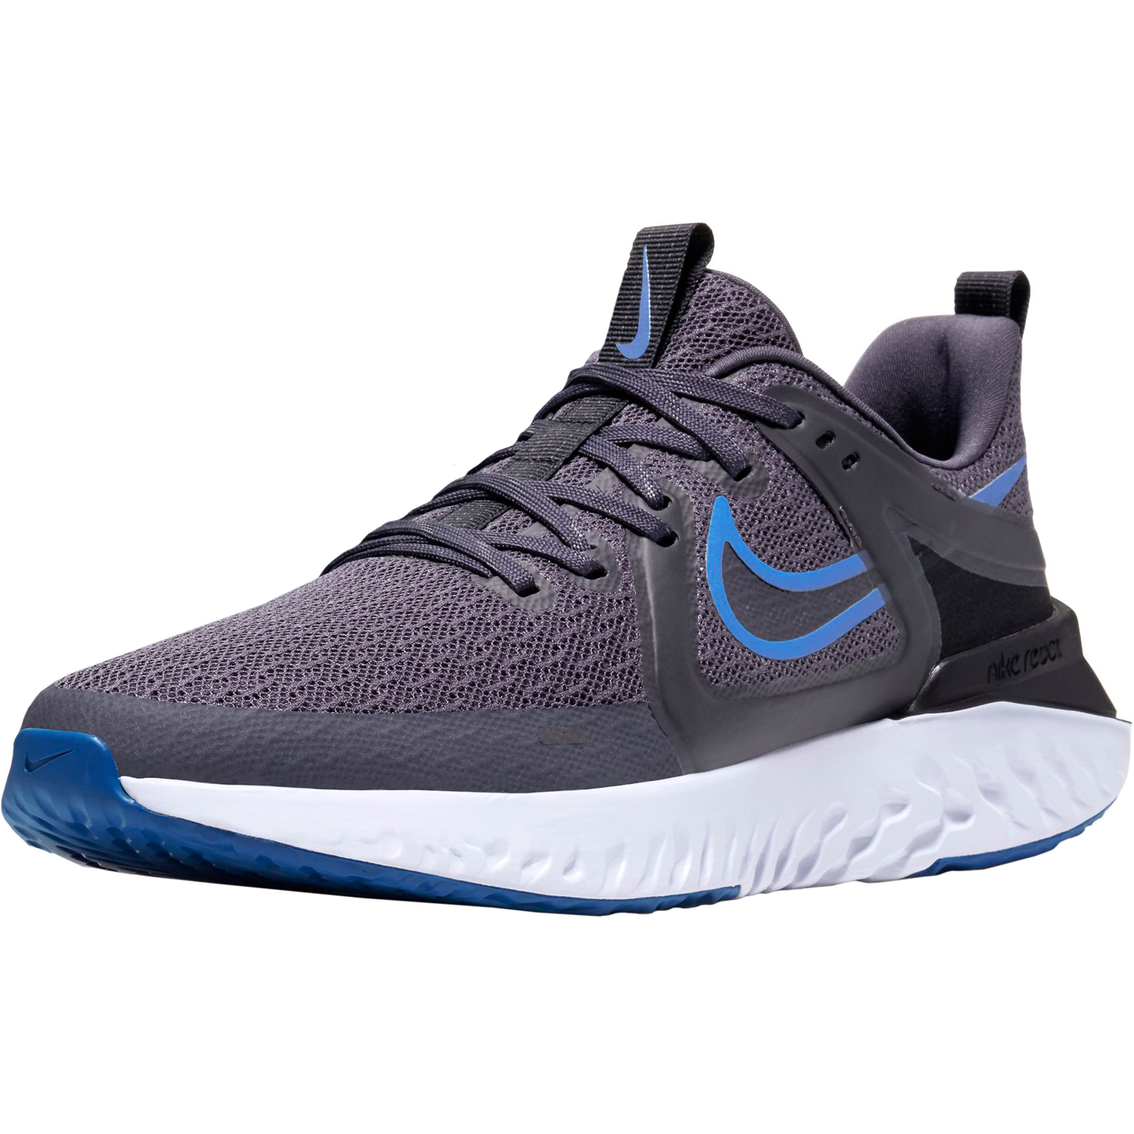 Nike Men's Legend React 2 Running Shoes | Running | Shoes | Shop ...